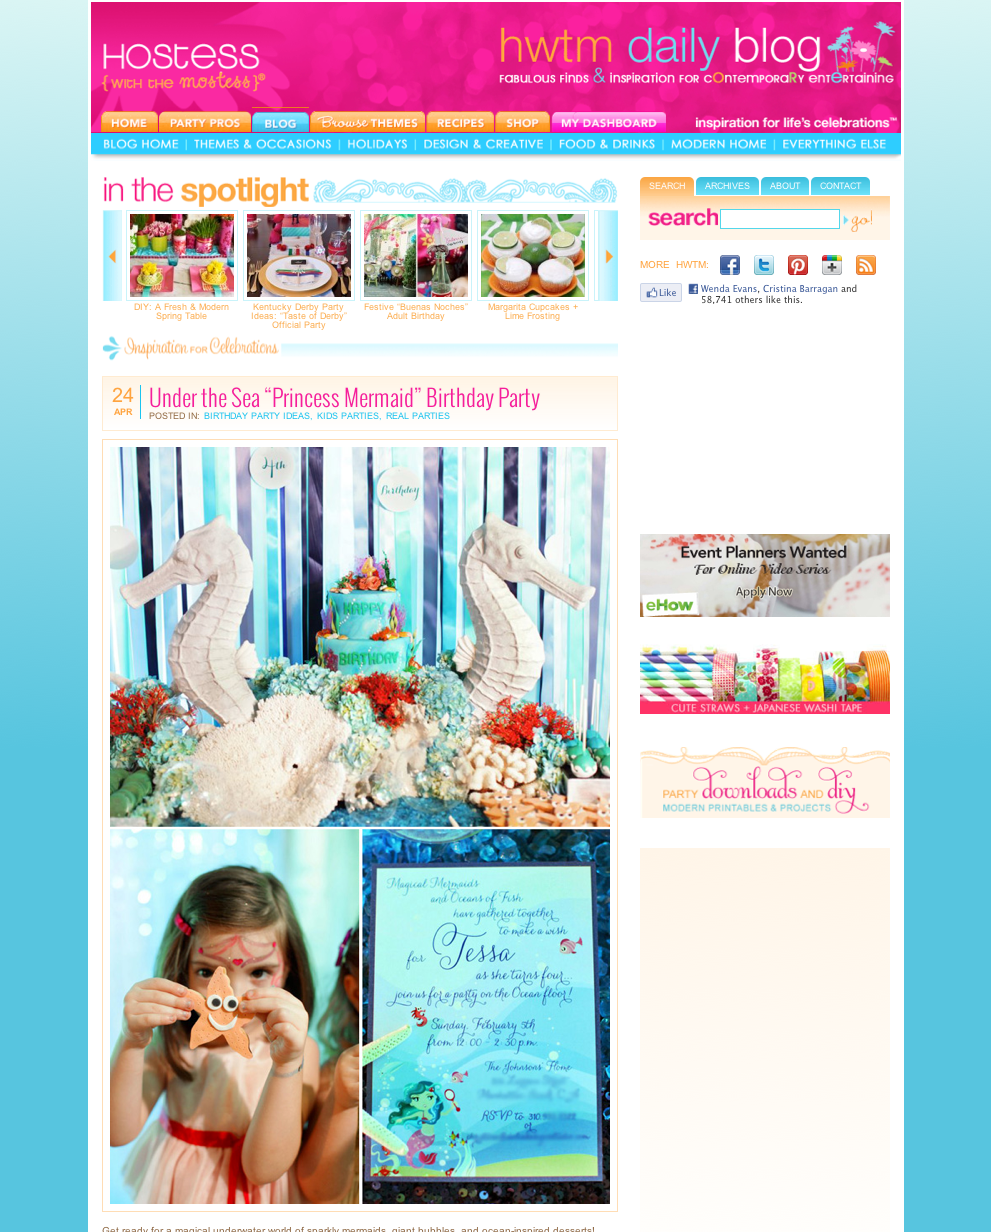 Under the sea birthday party theme, star fish cookies, seahorse birthday cake